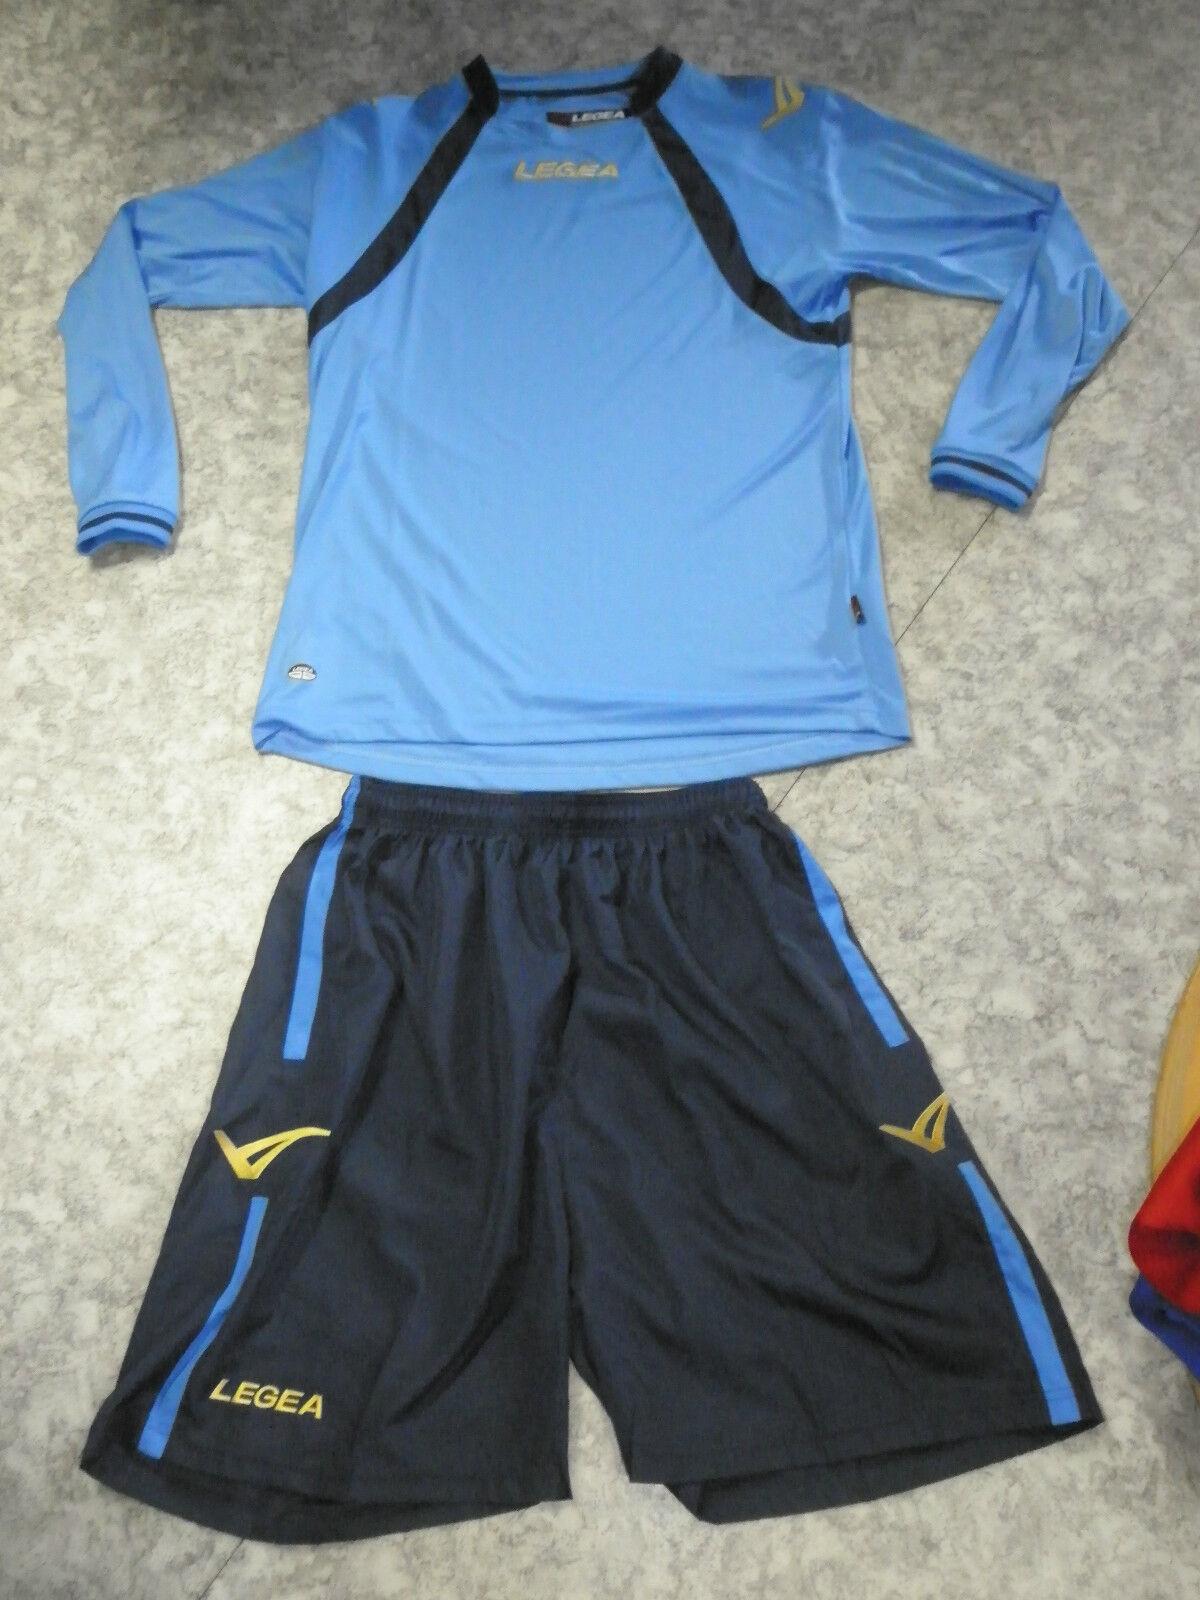 AKTION   14 Teamsport-Trikots DOVER    v.Legea,,hellblau blau,14 Sets  S 01a387